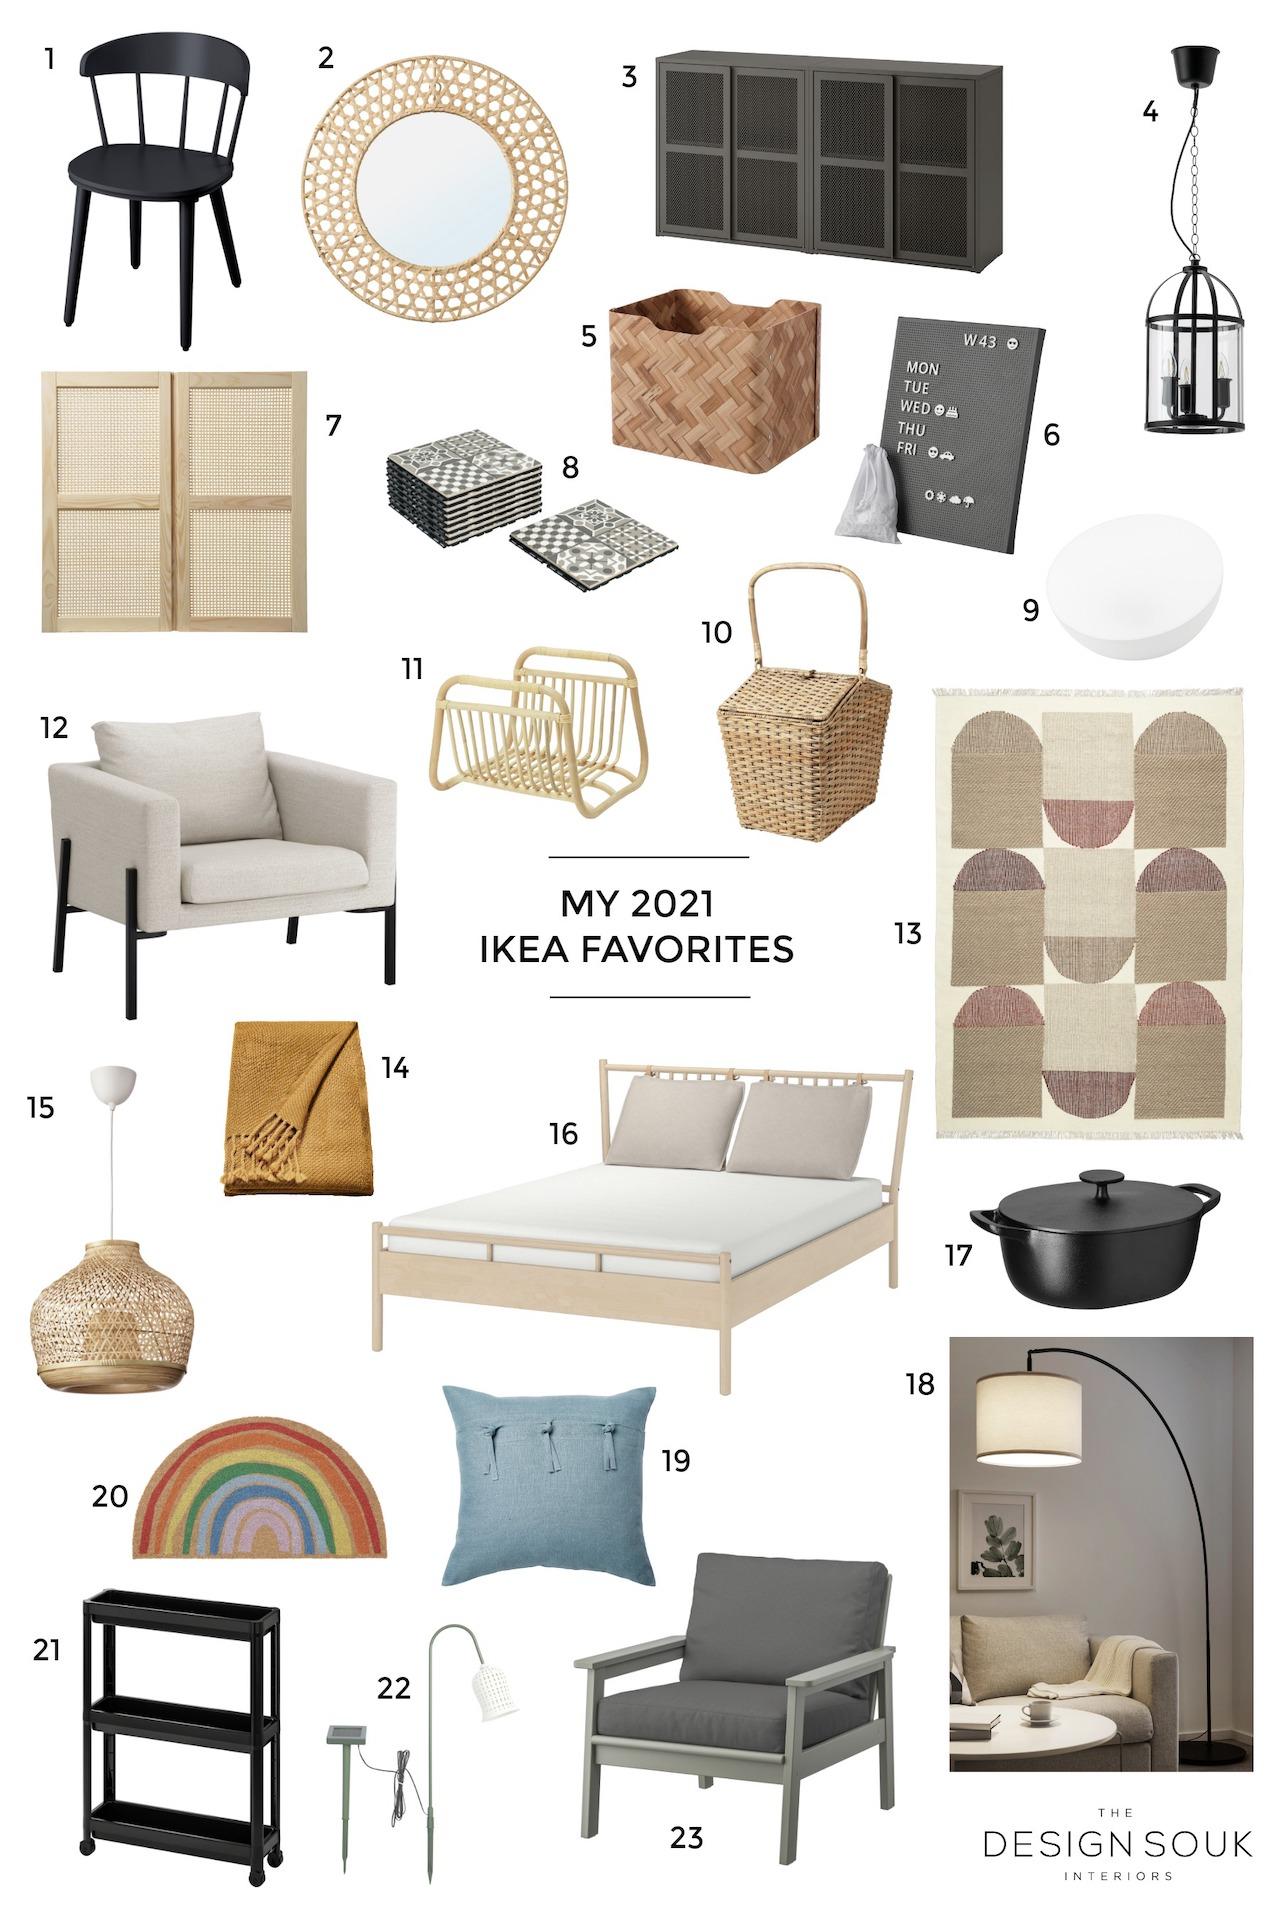 2021 IKEA Favorites